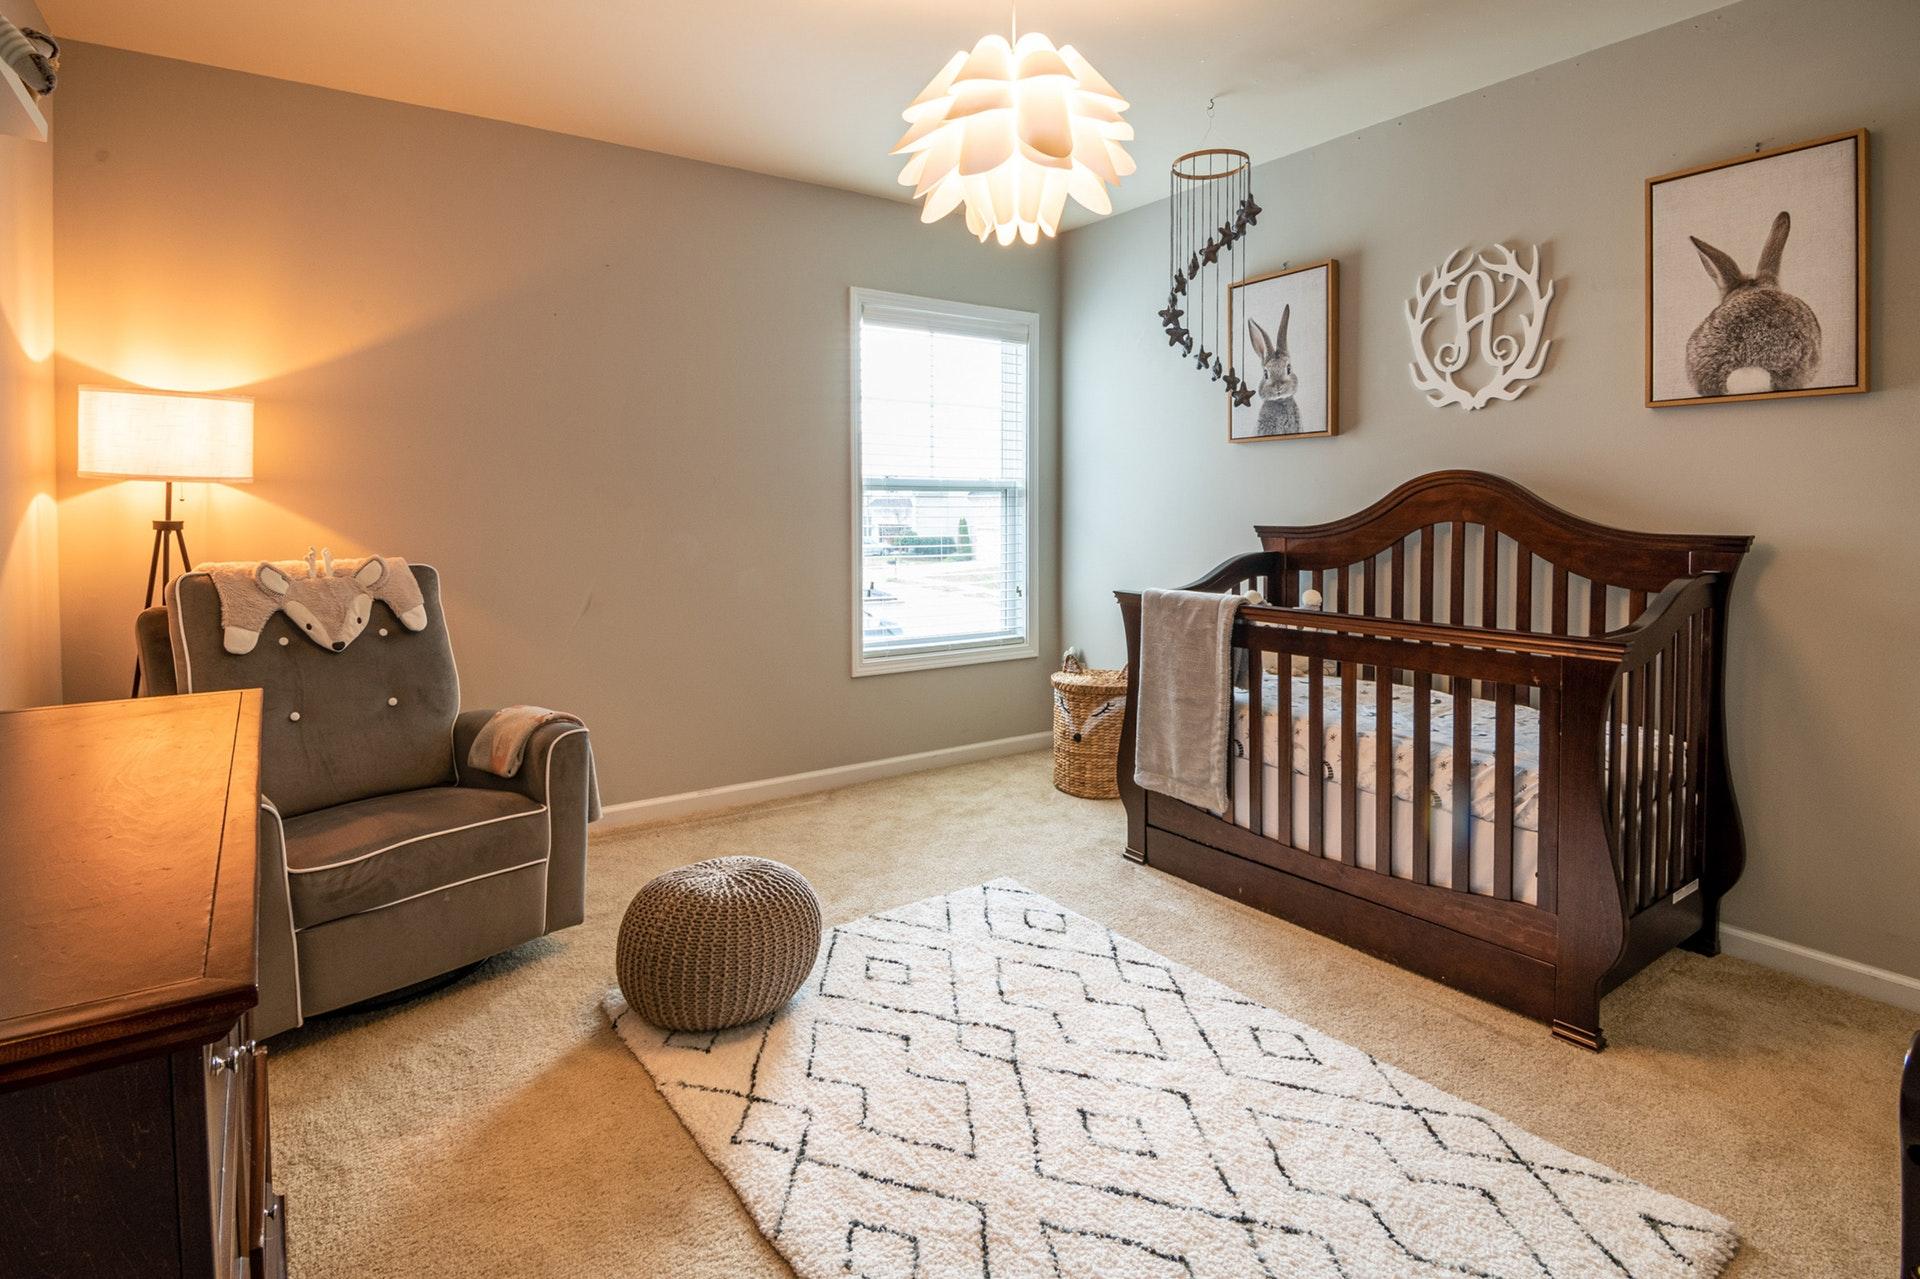 brown wooden baby crib near white wooden framed glass window